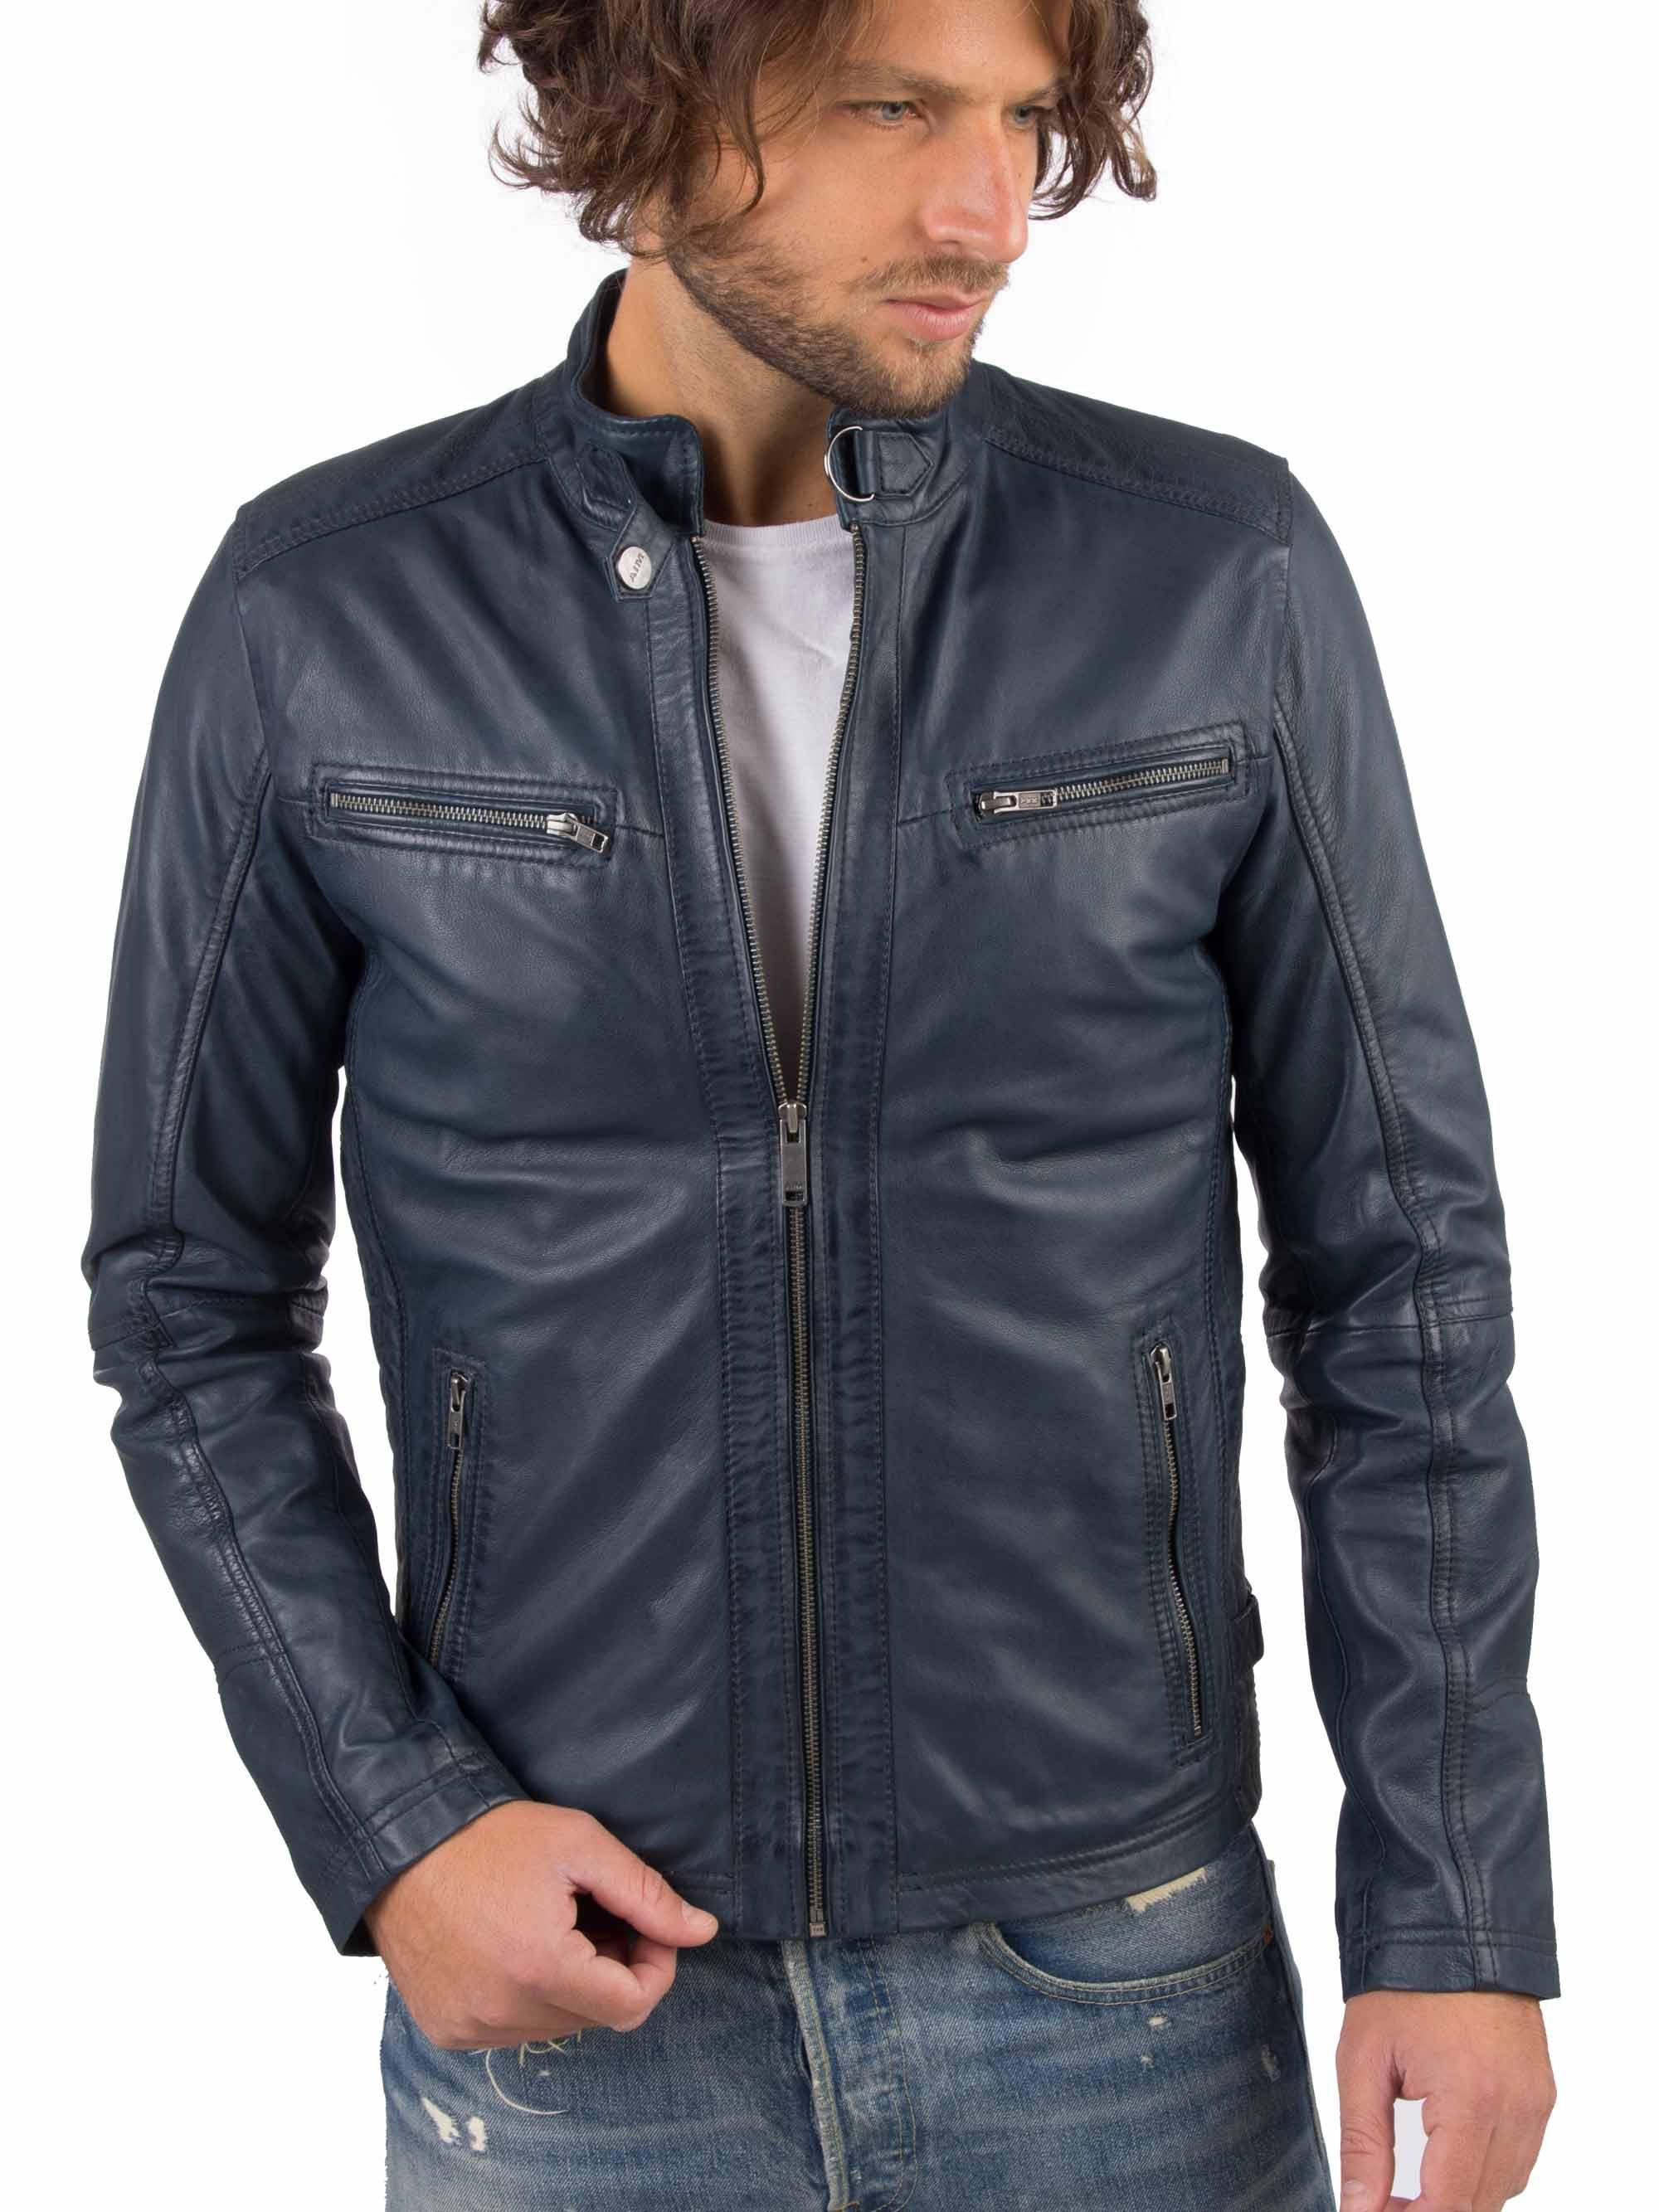 H91b6a51fbf3c463bbf469ca2eaae1c84e VAINAS European Brand Mens Genuine Leather jacket for men Winter Real sheep leather jacket Motorcycle jackets Biker jackets Alfa